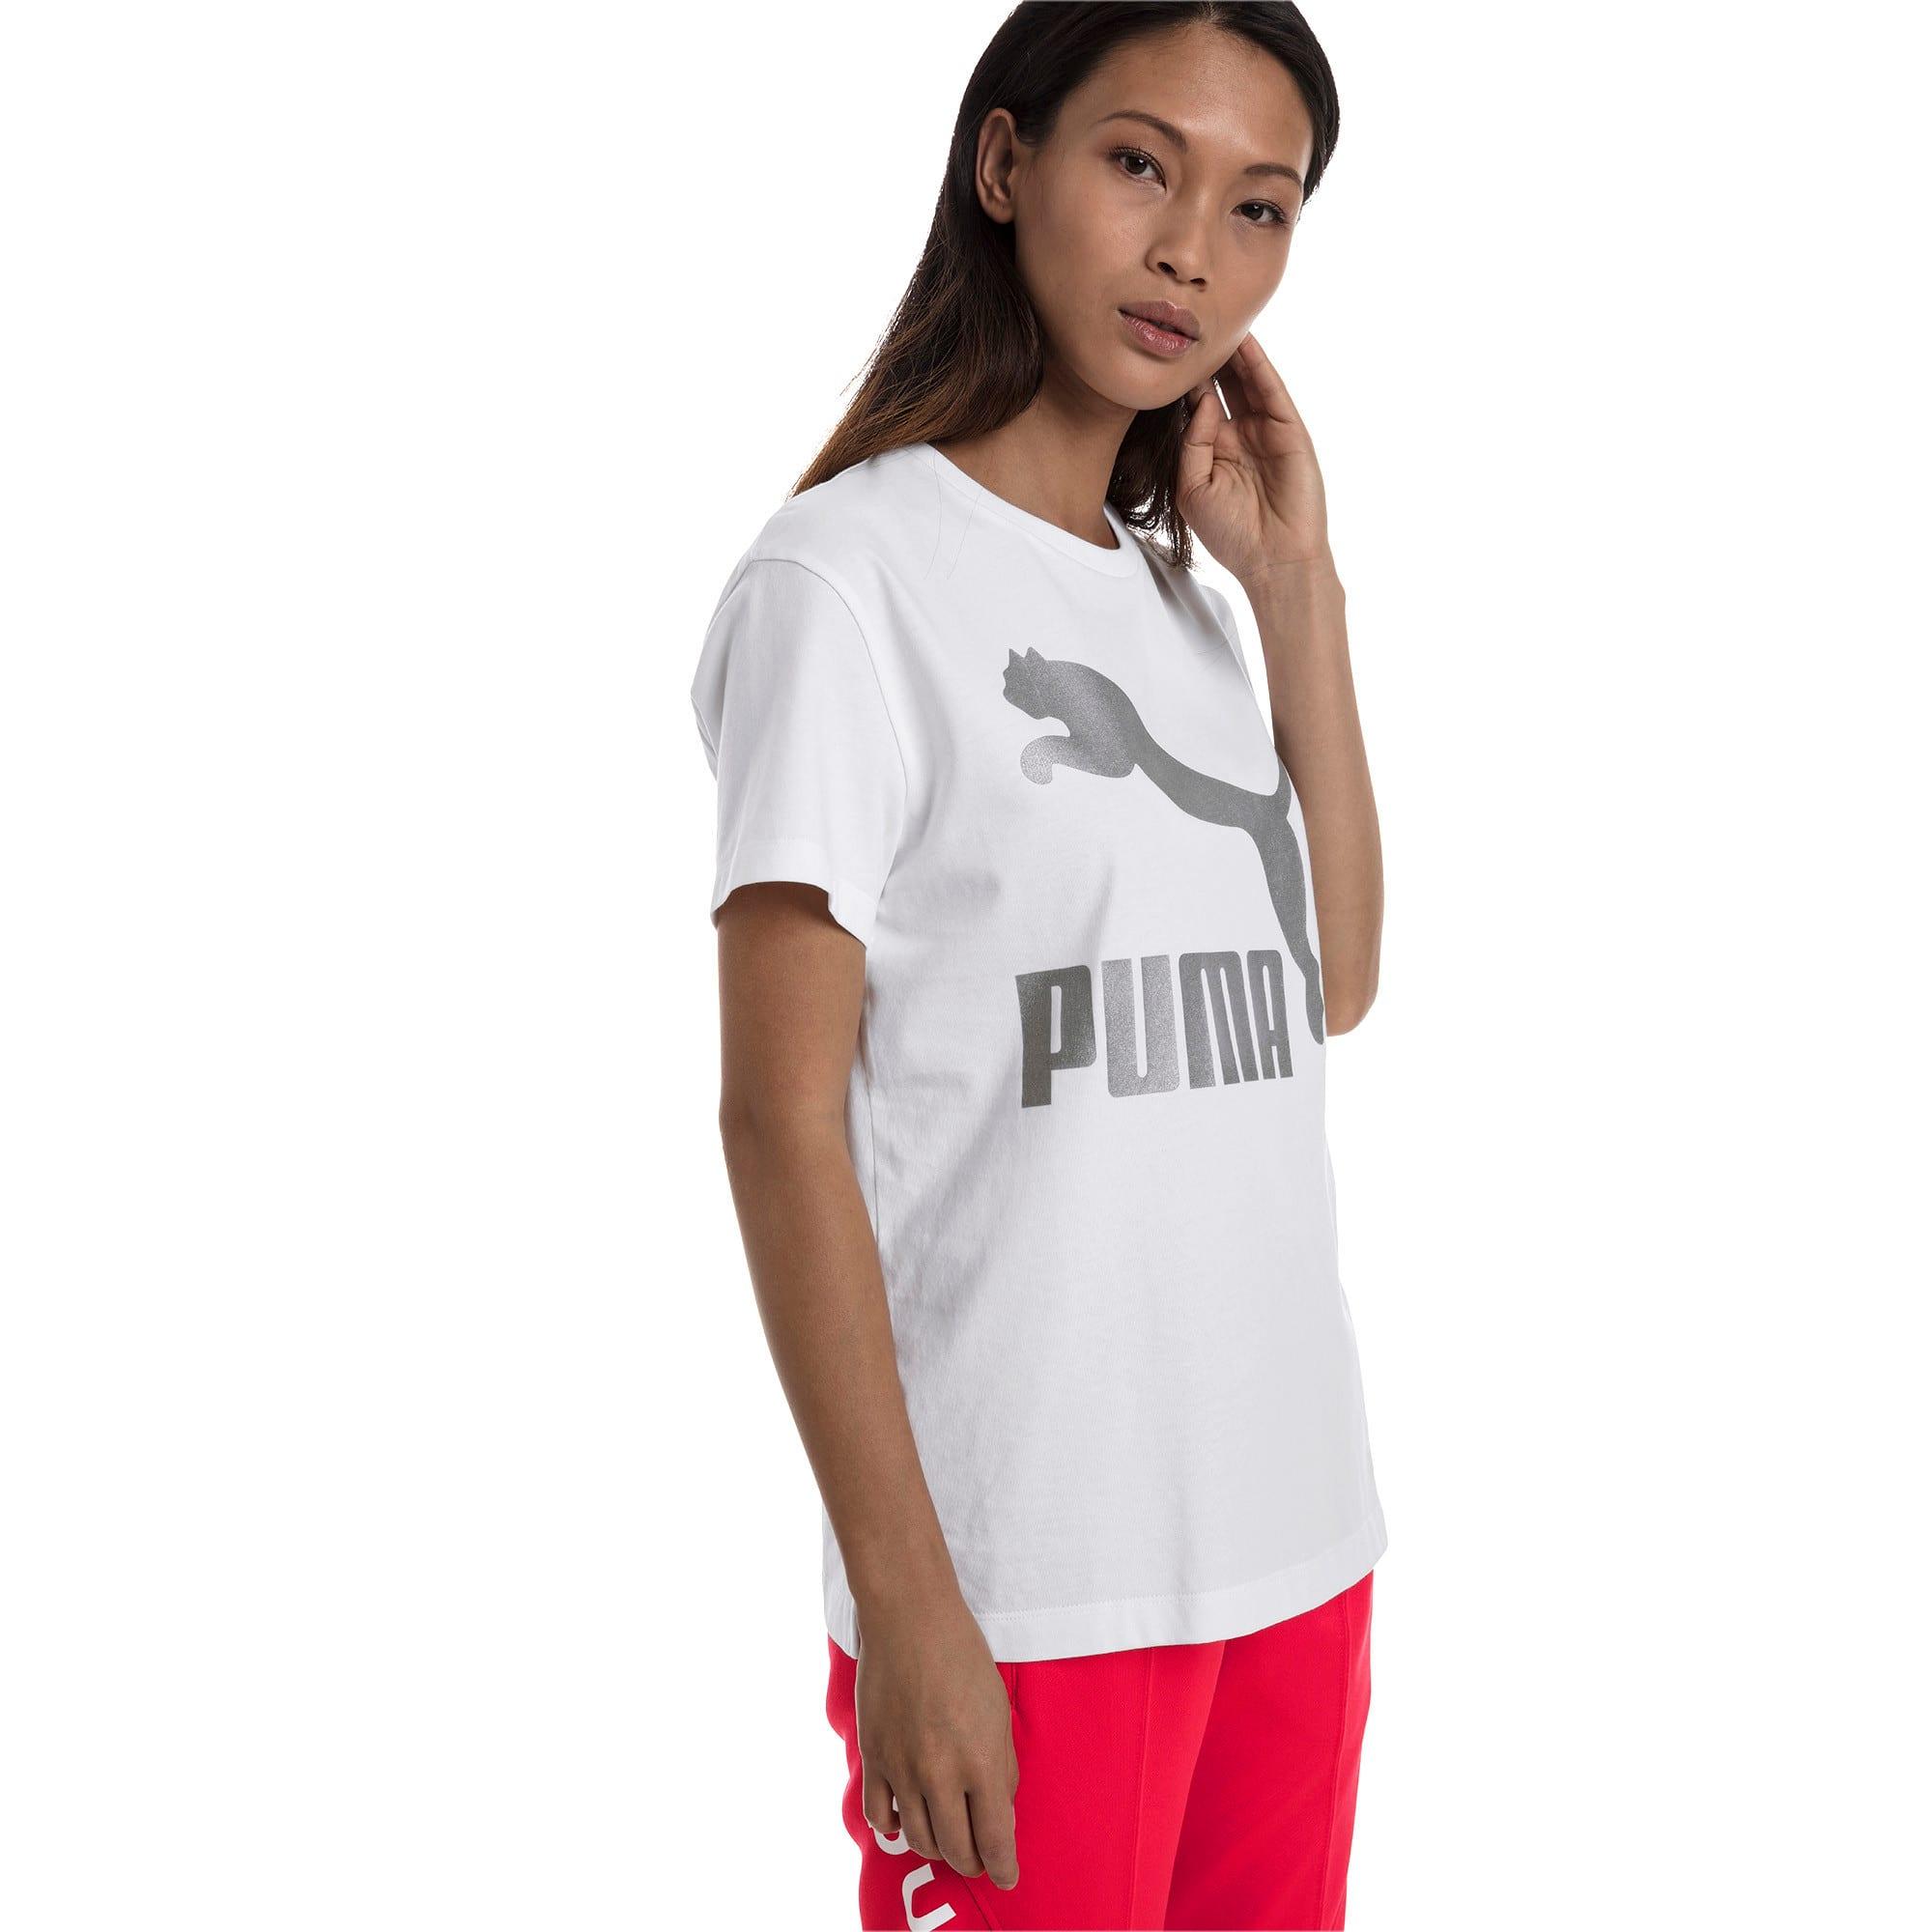 Thumbnail 2 of CLASSICS ロゴ ウィメンズ SS Tシャツ 半袖, Puma White-metal, medium-JPN